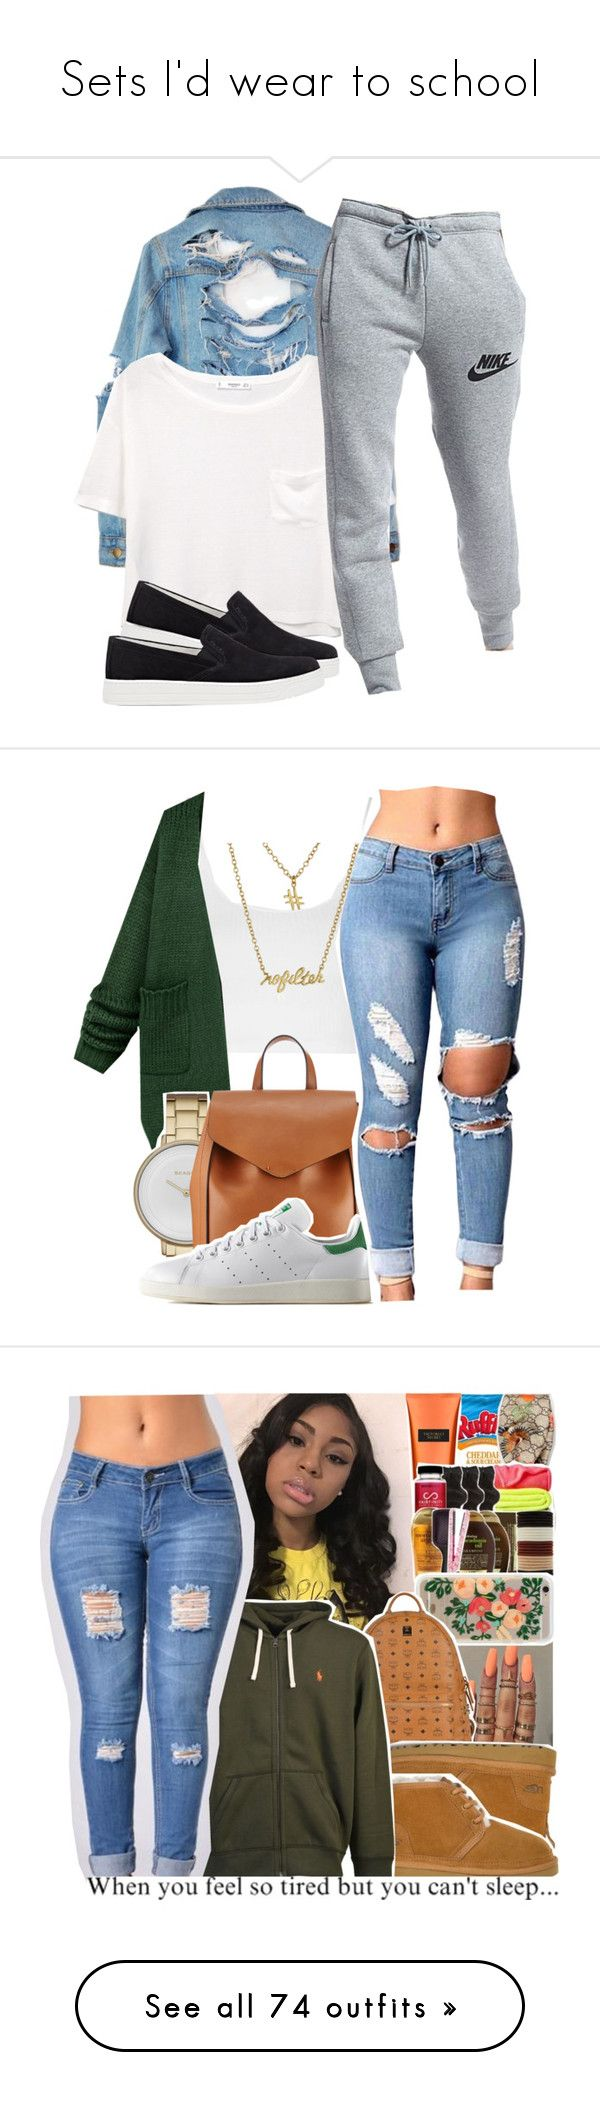 """Sets I'd wear to school"" by leah143love ❤ liked on Polyvore featuring High Heels Suicide, MANGO, NIKE, Prada Sport, Topshop, Skagen, Loeffler Randall, adidas Originals, Gorjana and Victoria's Secret"